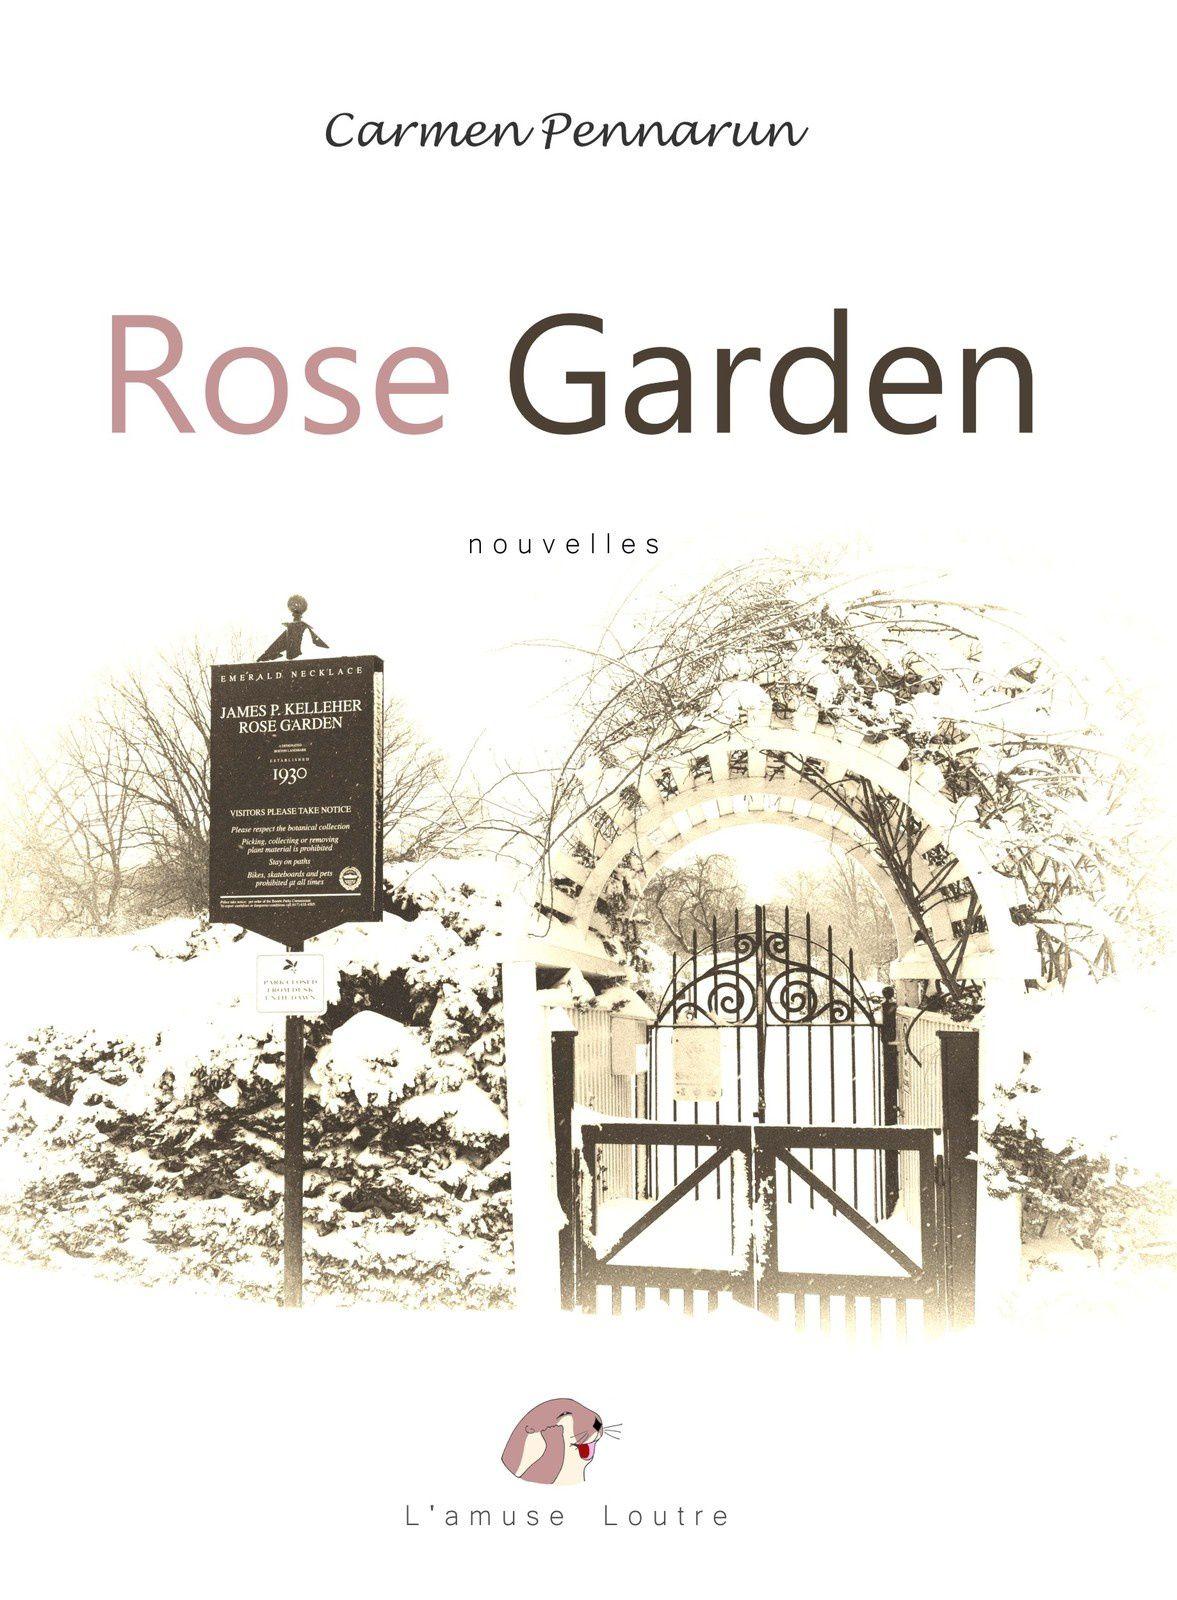 Rose Garden (le livre)